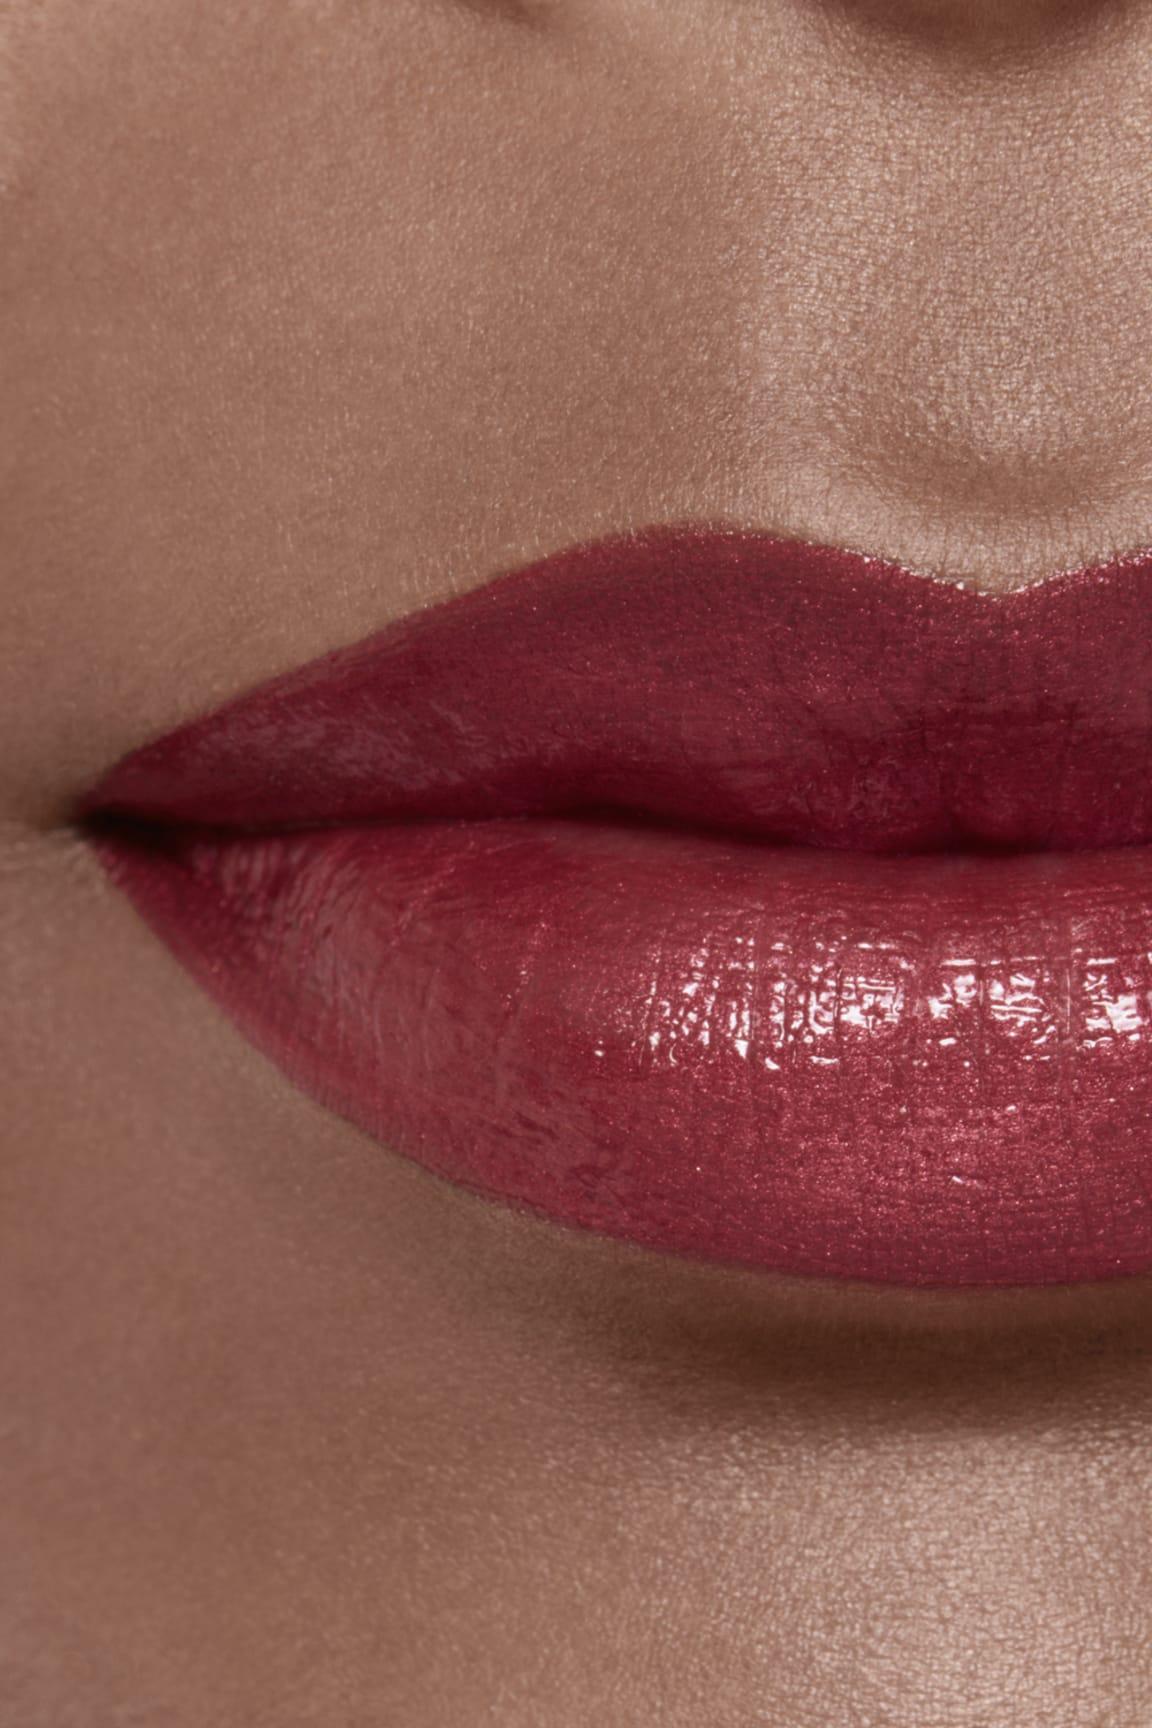 Application makeup visual 2 - ROUGE ALLURE LAQUE 77 - DARK BLOSSOM